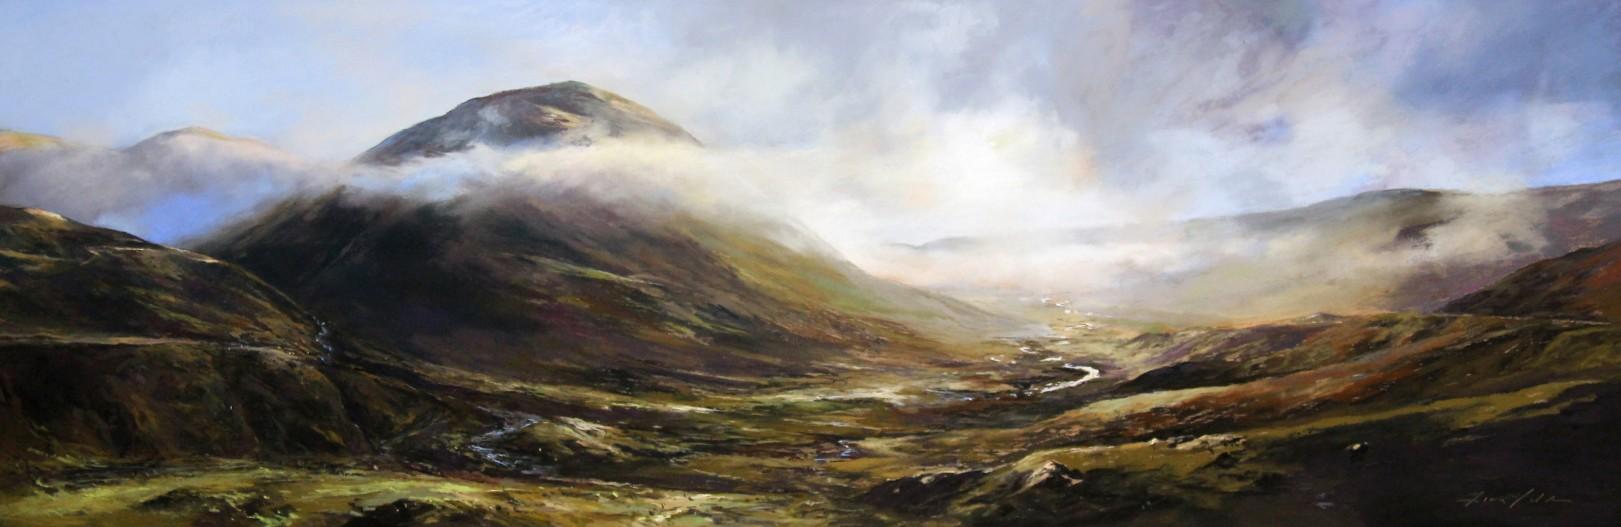 Fiona Haldane_Falling Mist, Glenshee_Pastel_16x48